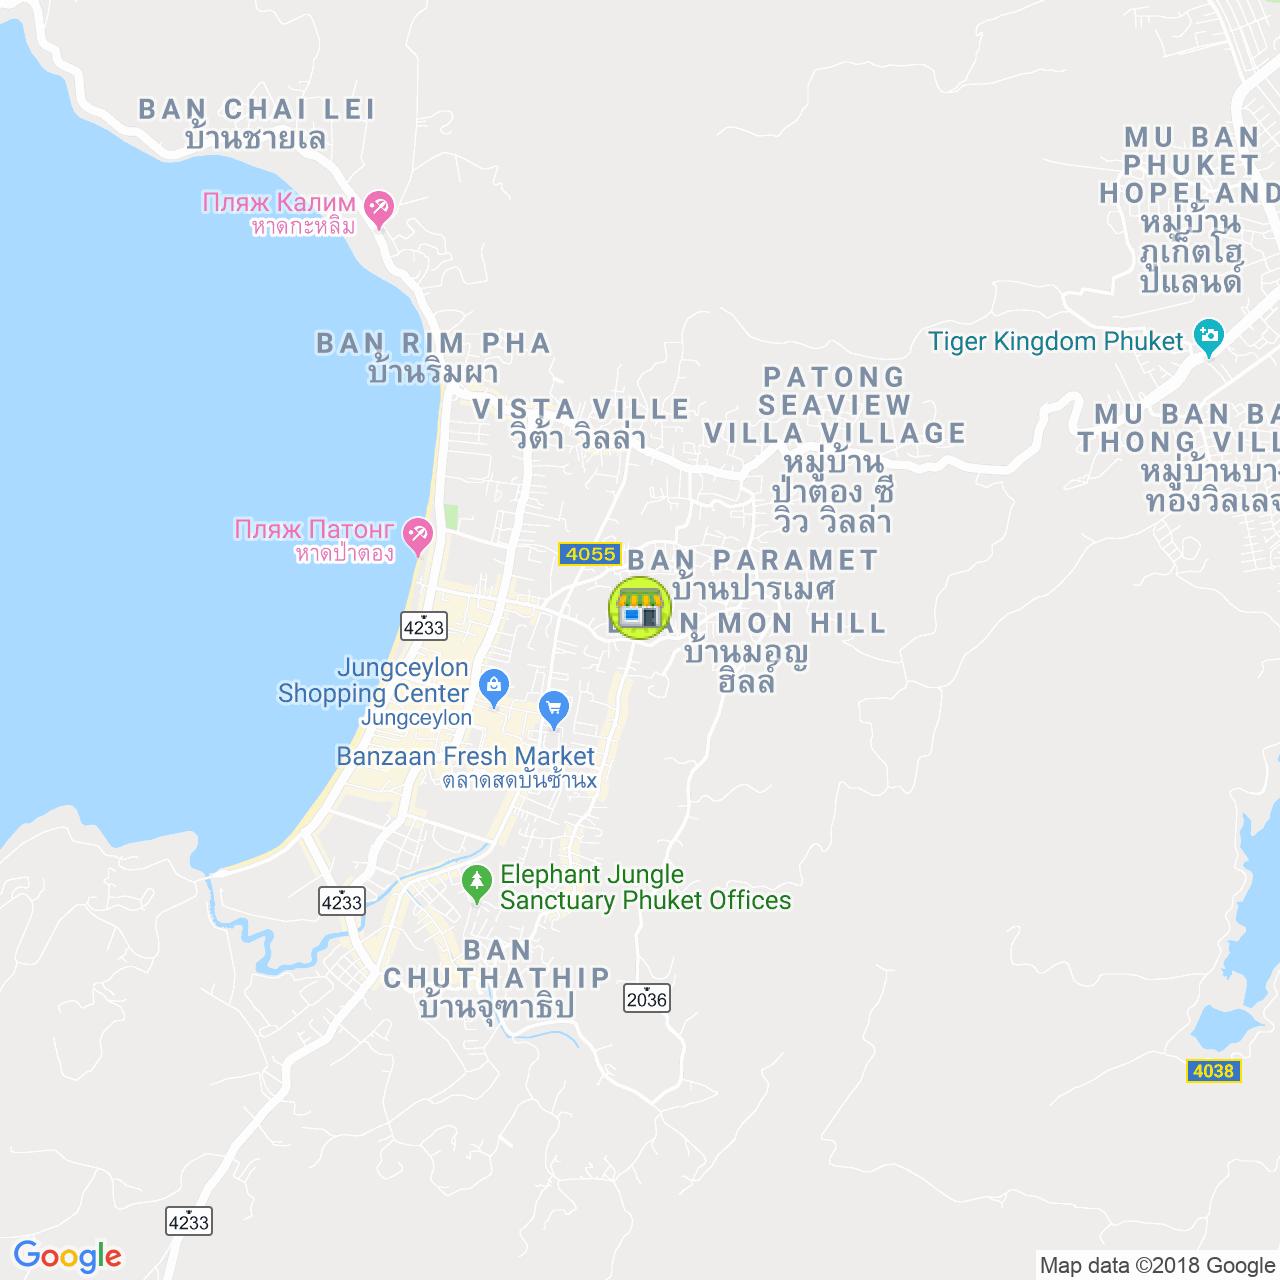 Цветочный магазин на Патонге на карте Пхукета